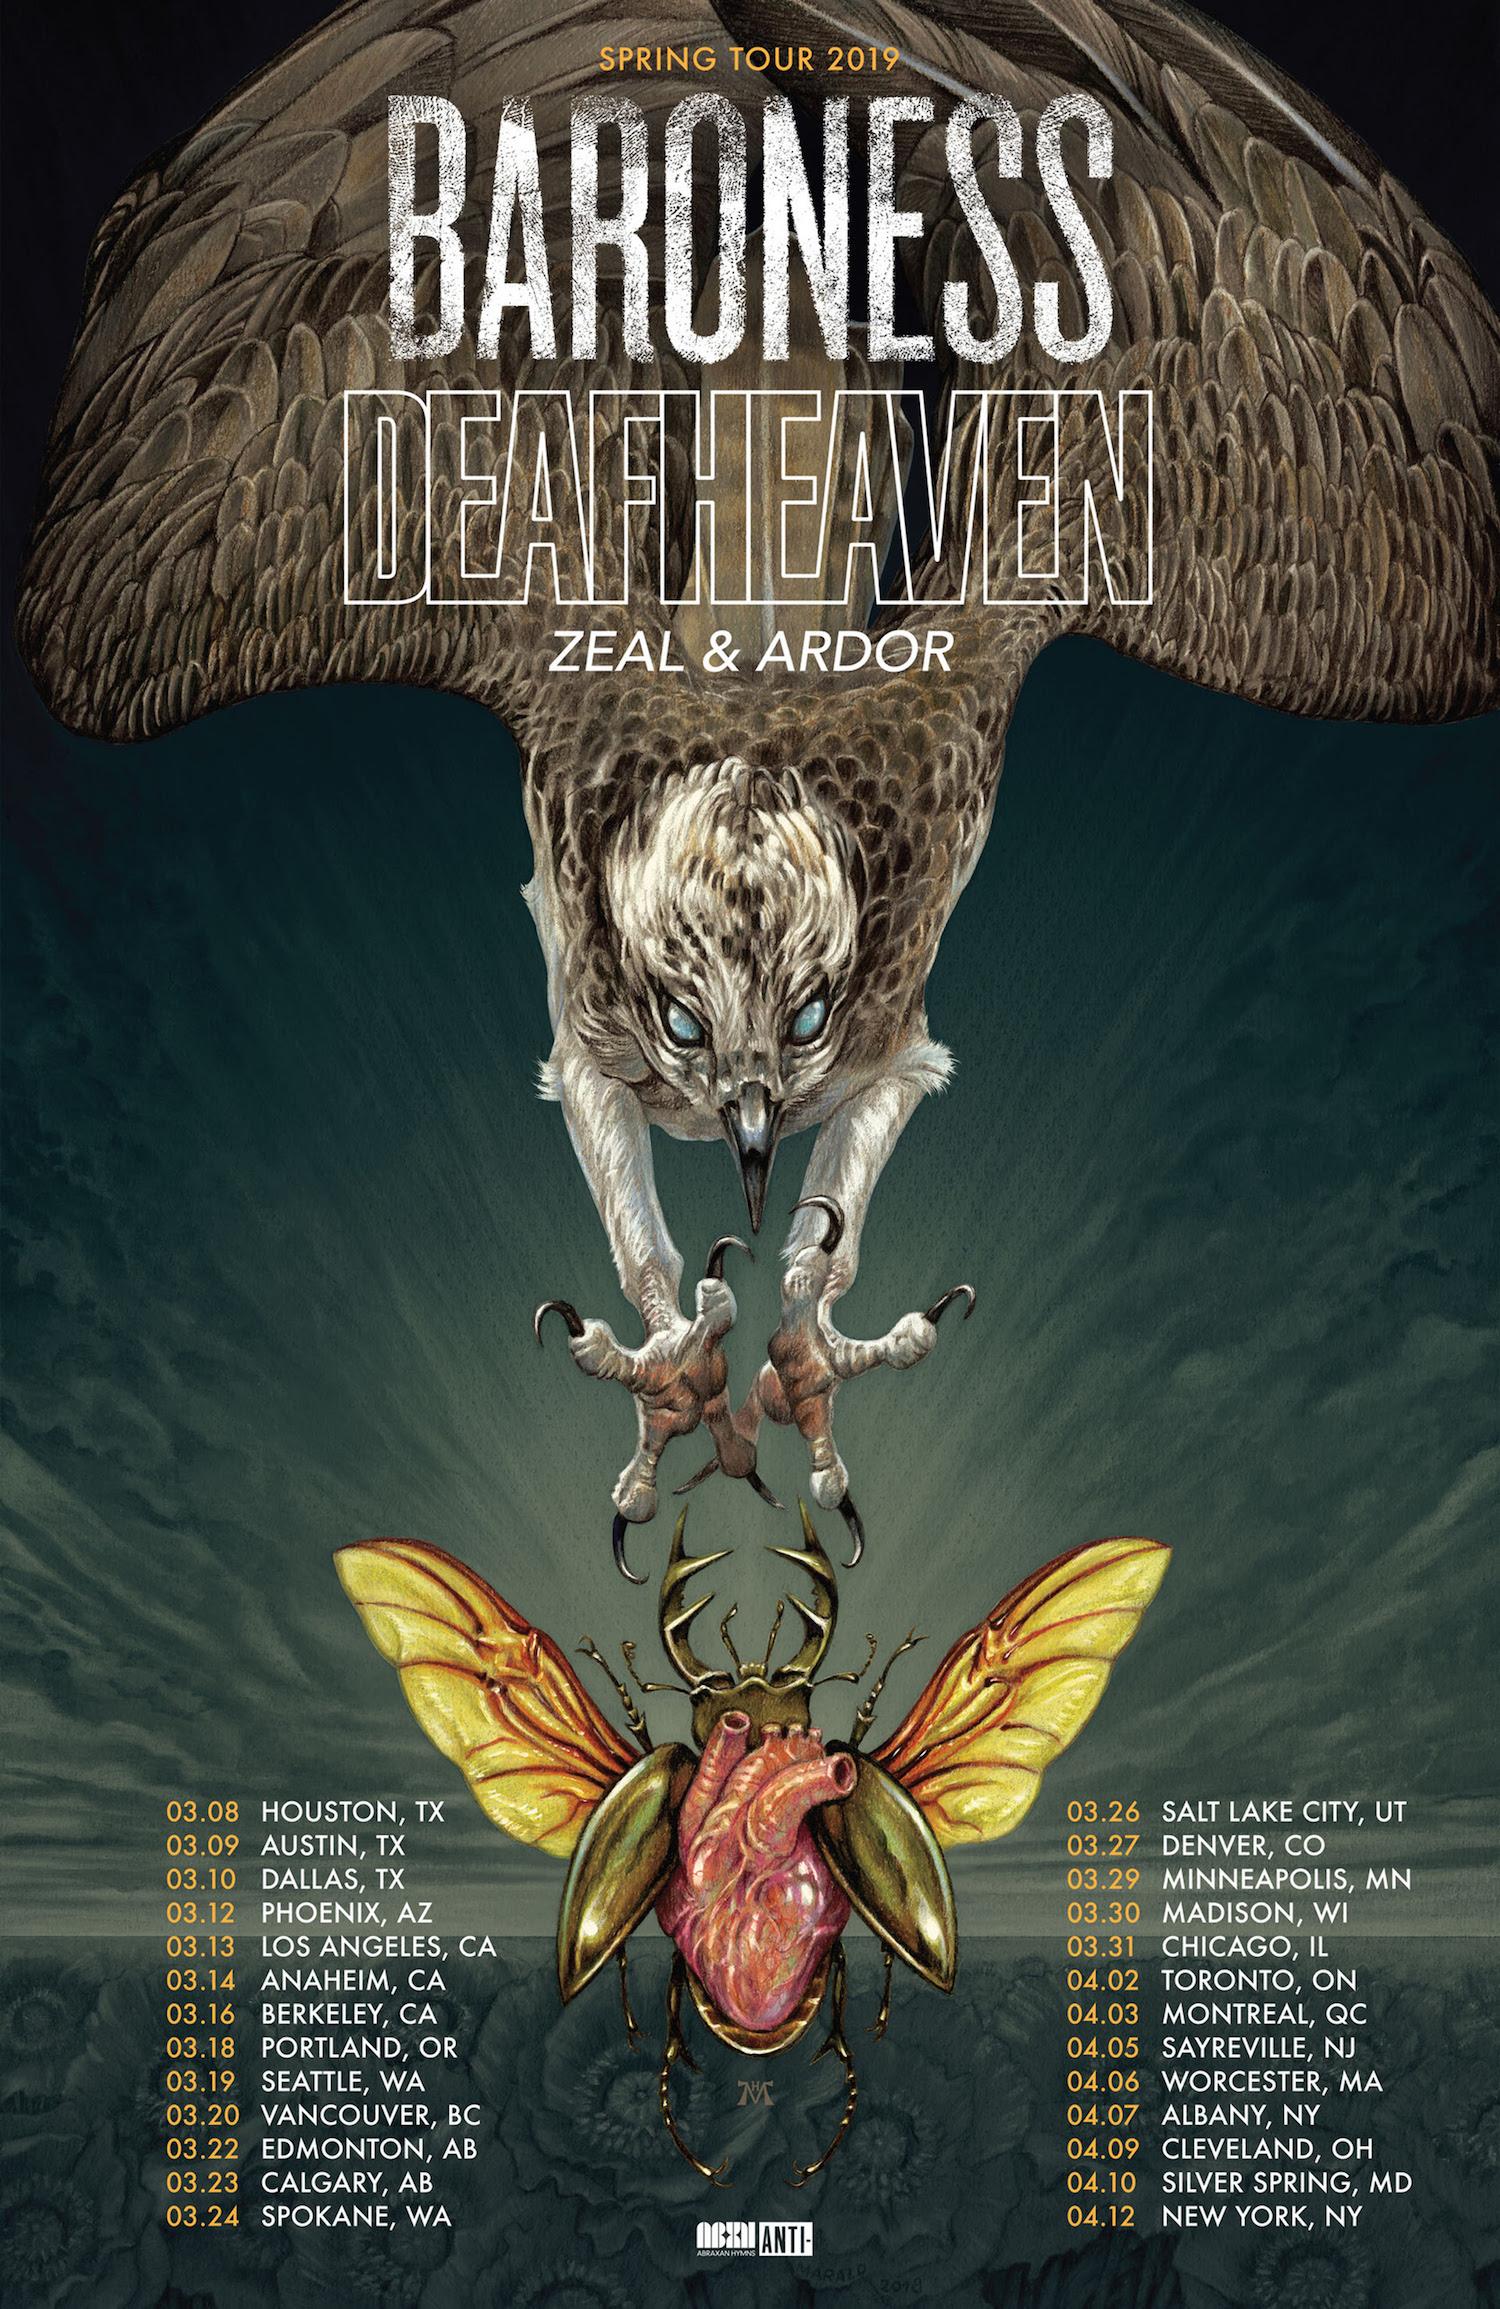 Baroness Deafheaven tour poster